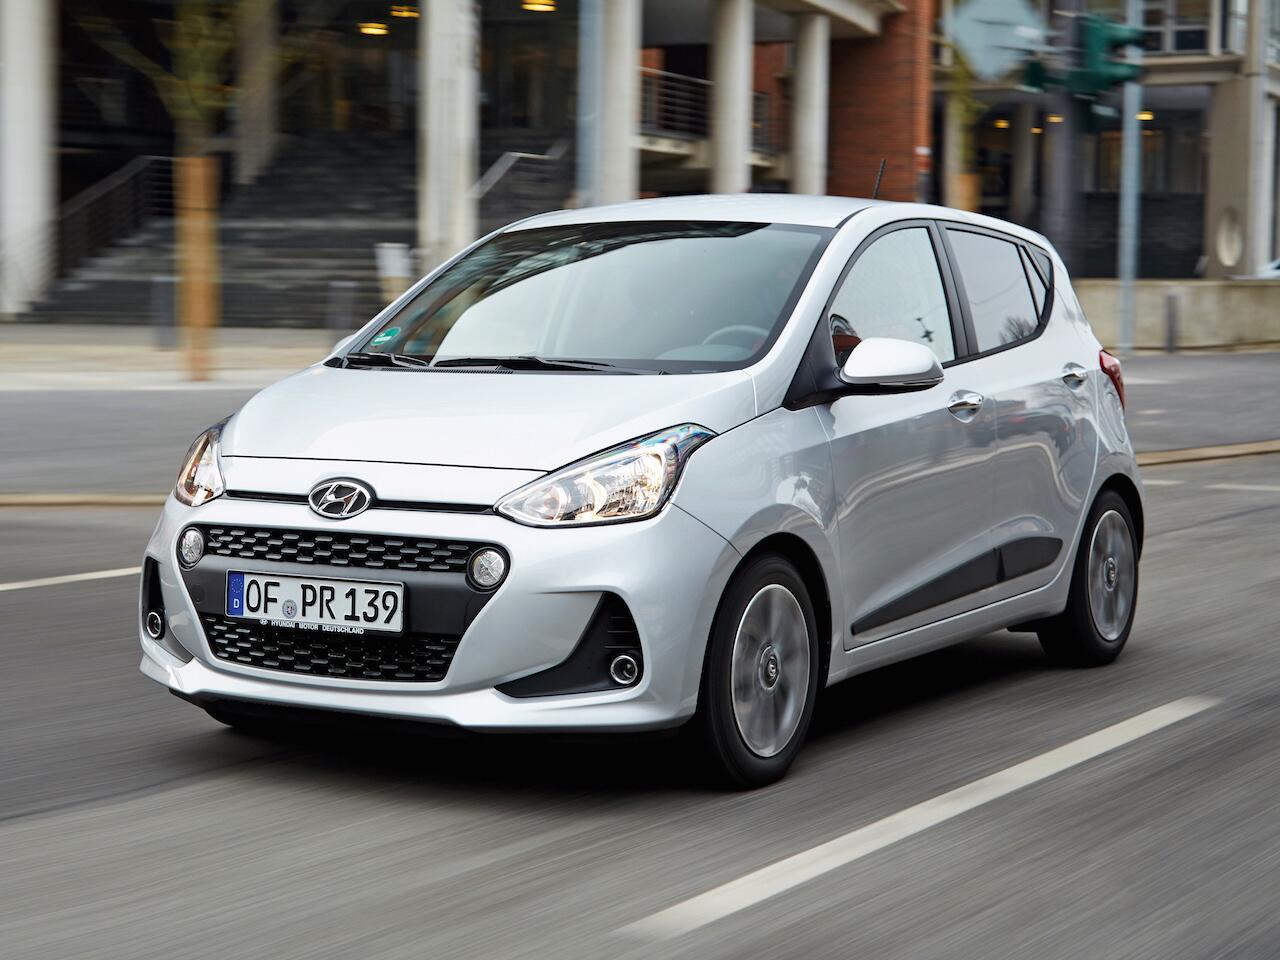 Bild zu Platz 9: Hyundai i10